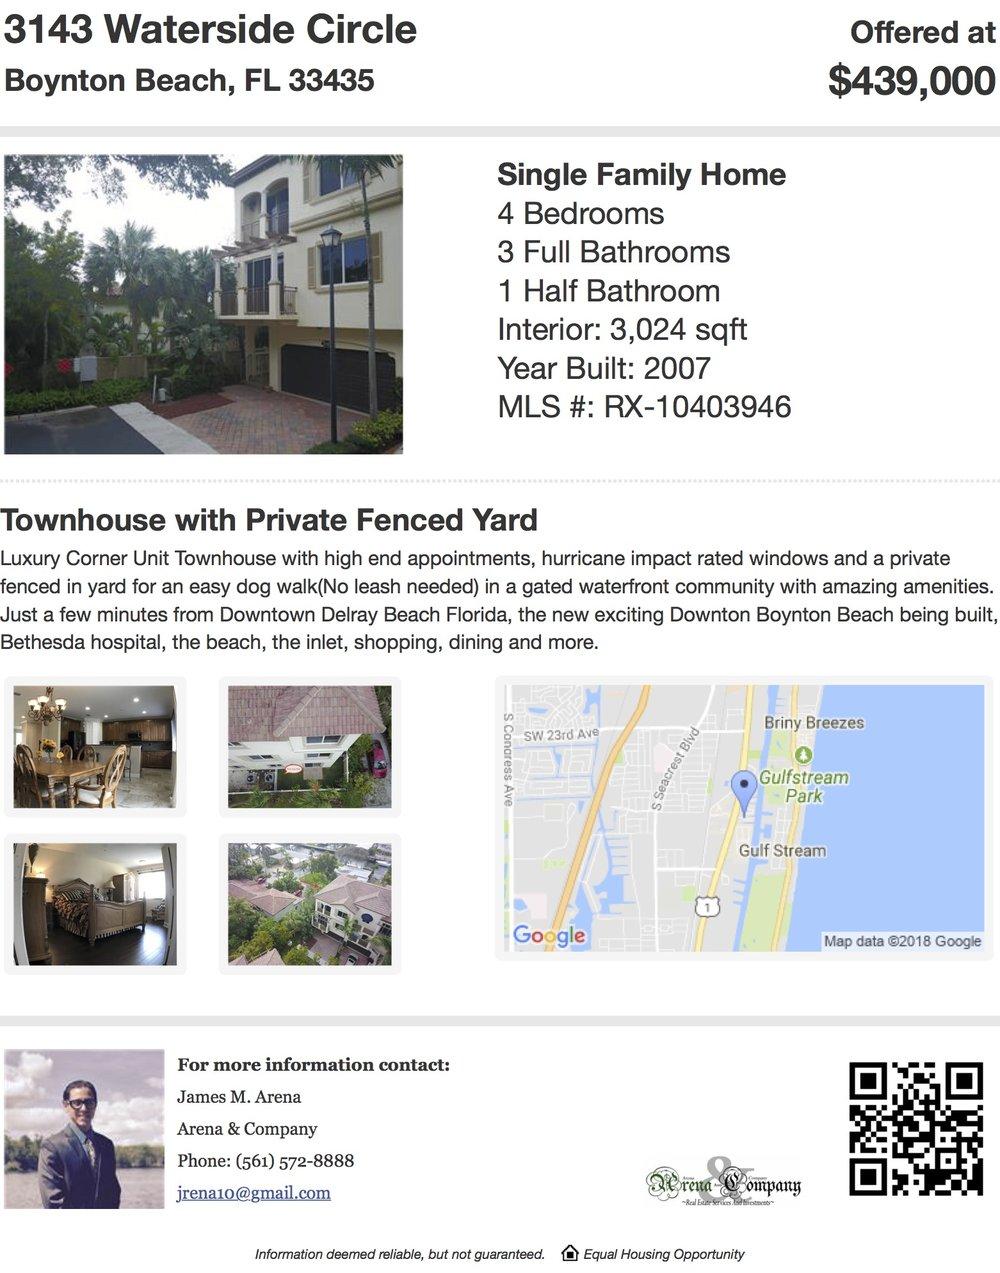 Printable Flyer of 3143 Waterside Circle, Boynton Beach, FL 33435, USA.jpg